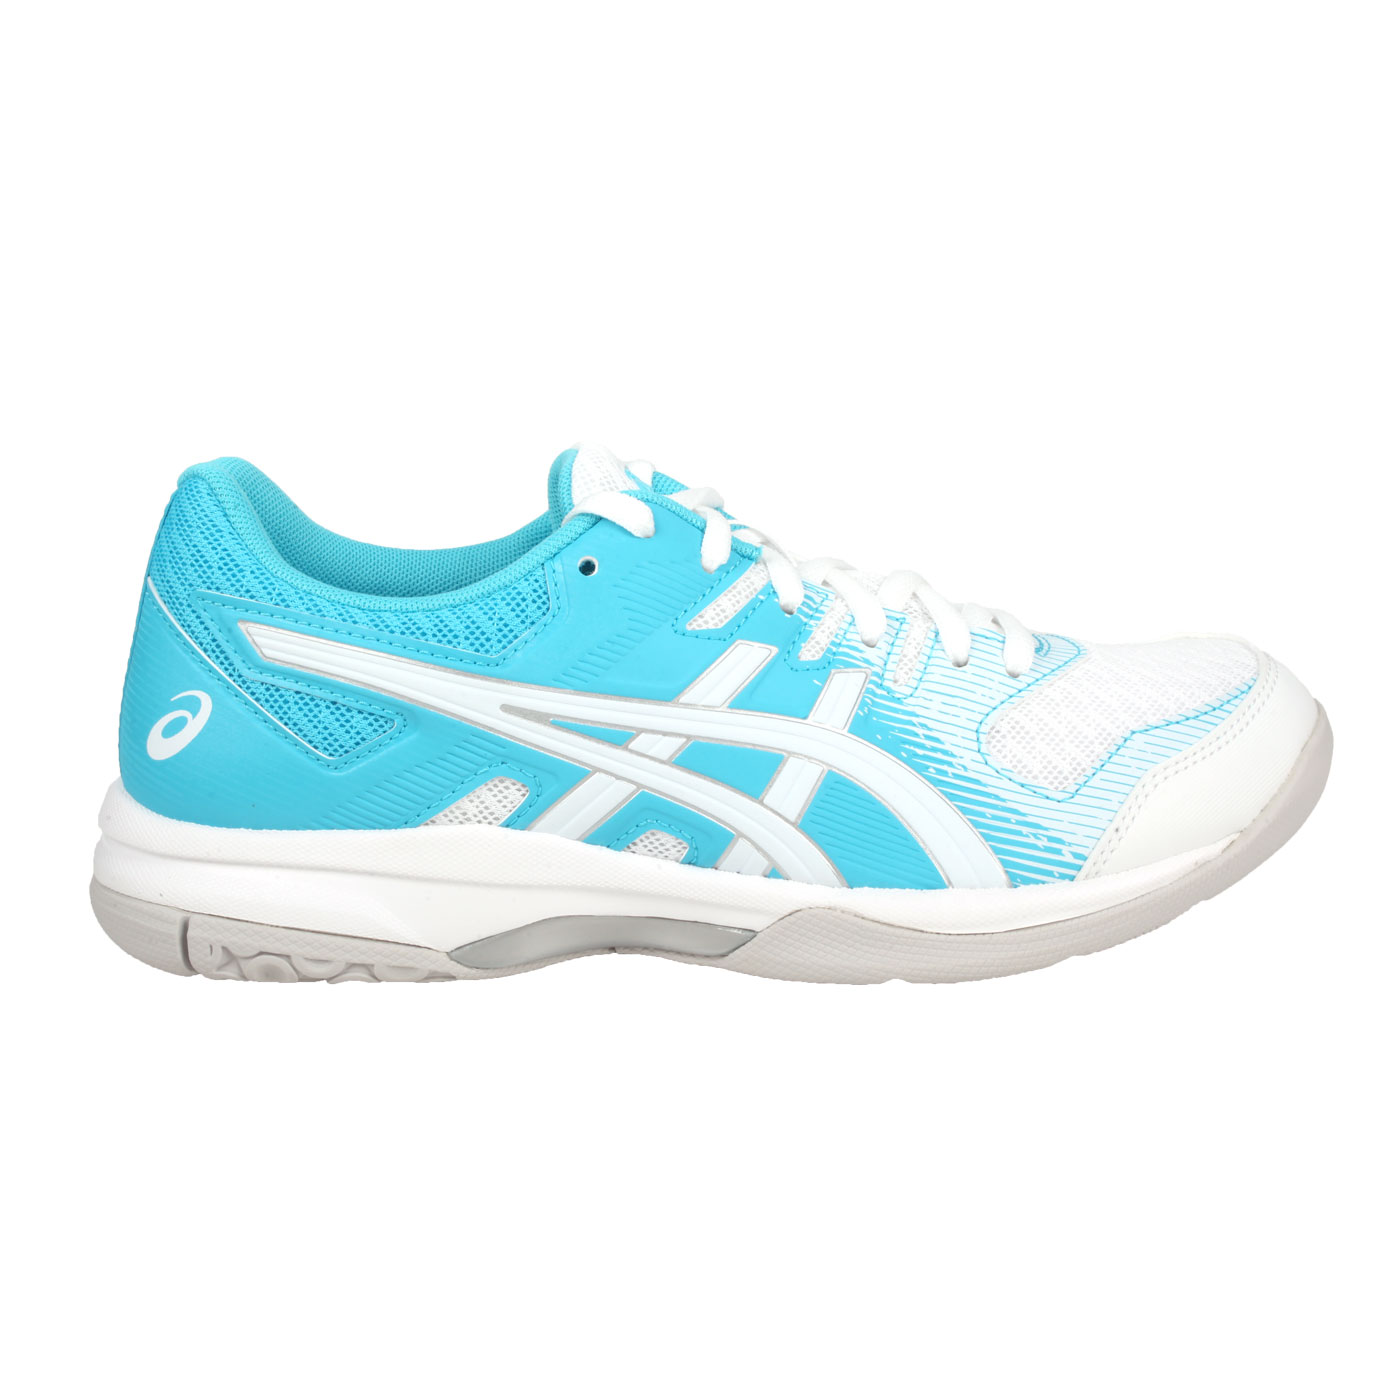 ASICS 女款排羽球鞋  @GEL-ROCKET 9@1072A034-003 - 白白水藍